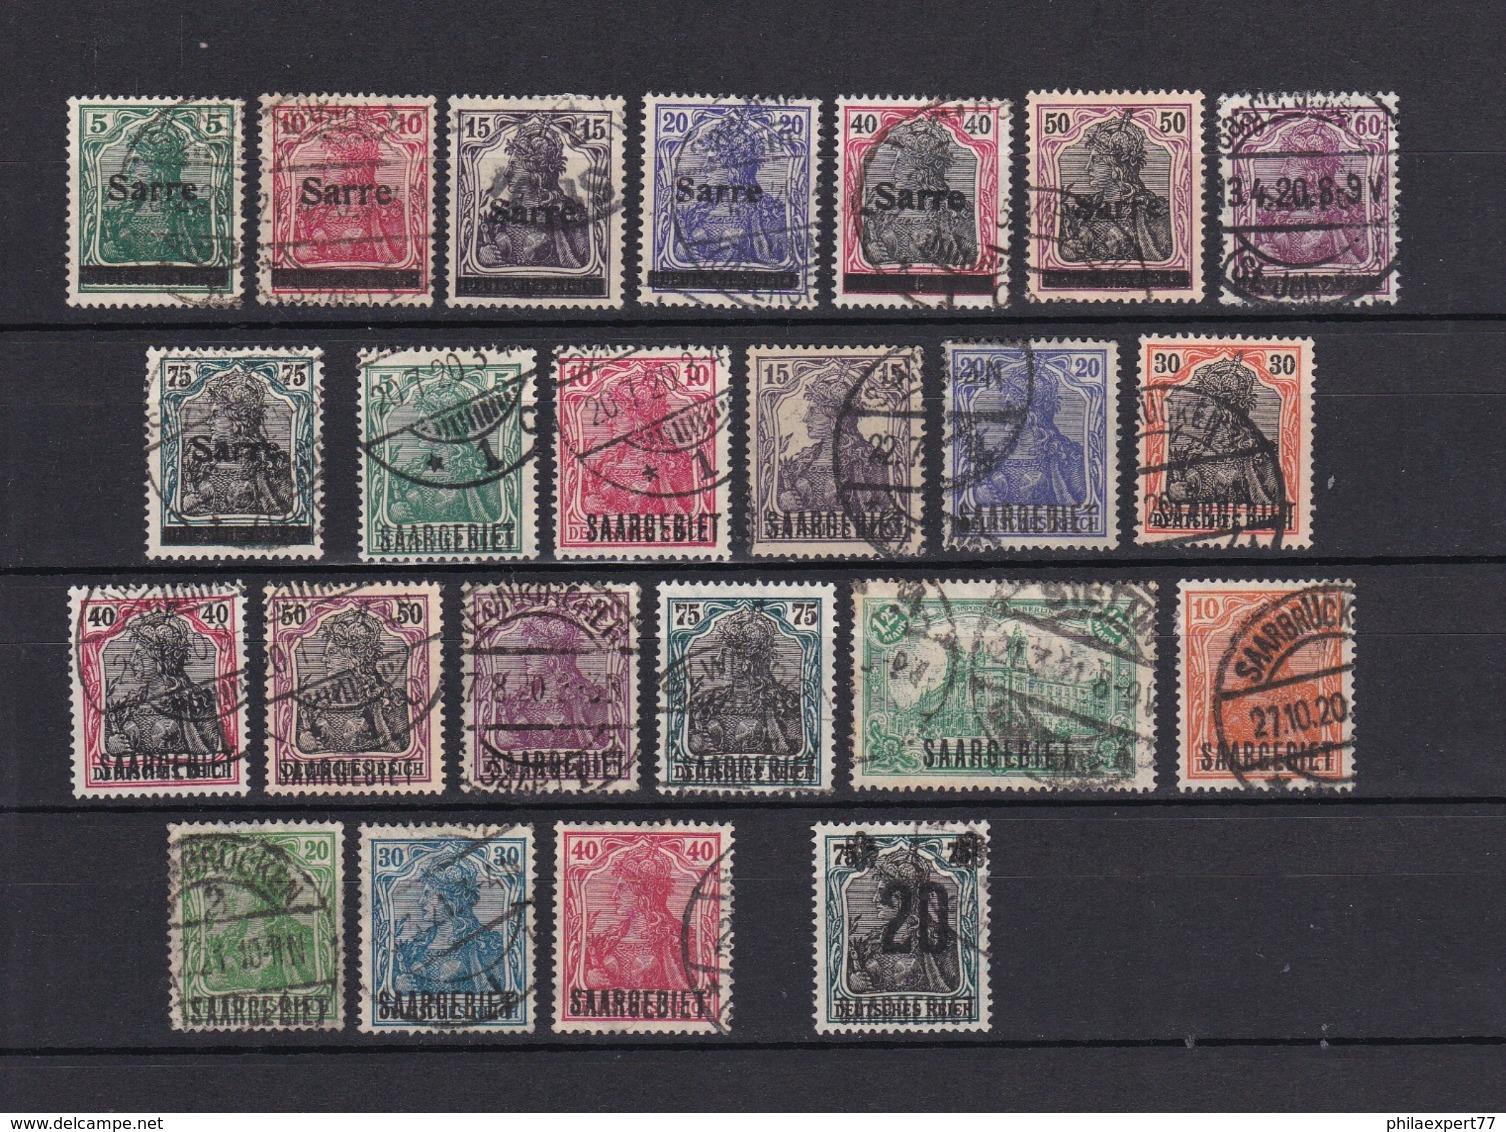 Saargebiet - 1920/21 - Sammlung - Gest. - 1920-35 Saargebiet – Abstimmungsgebiet